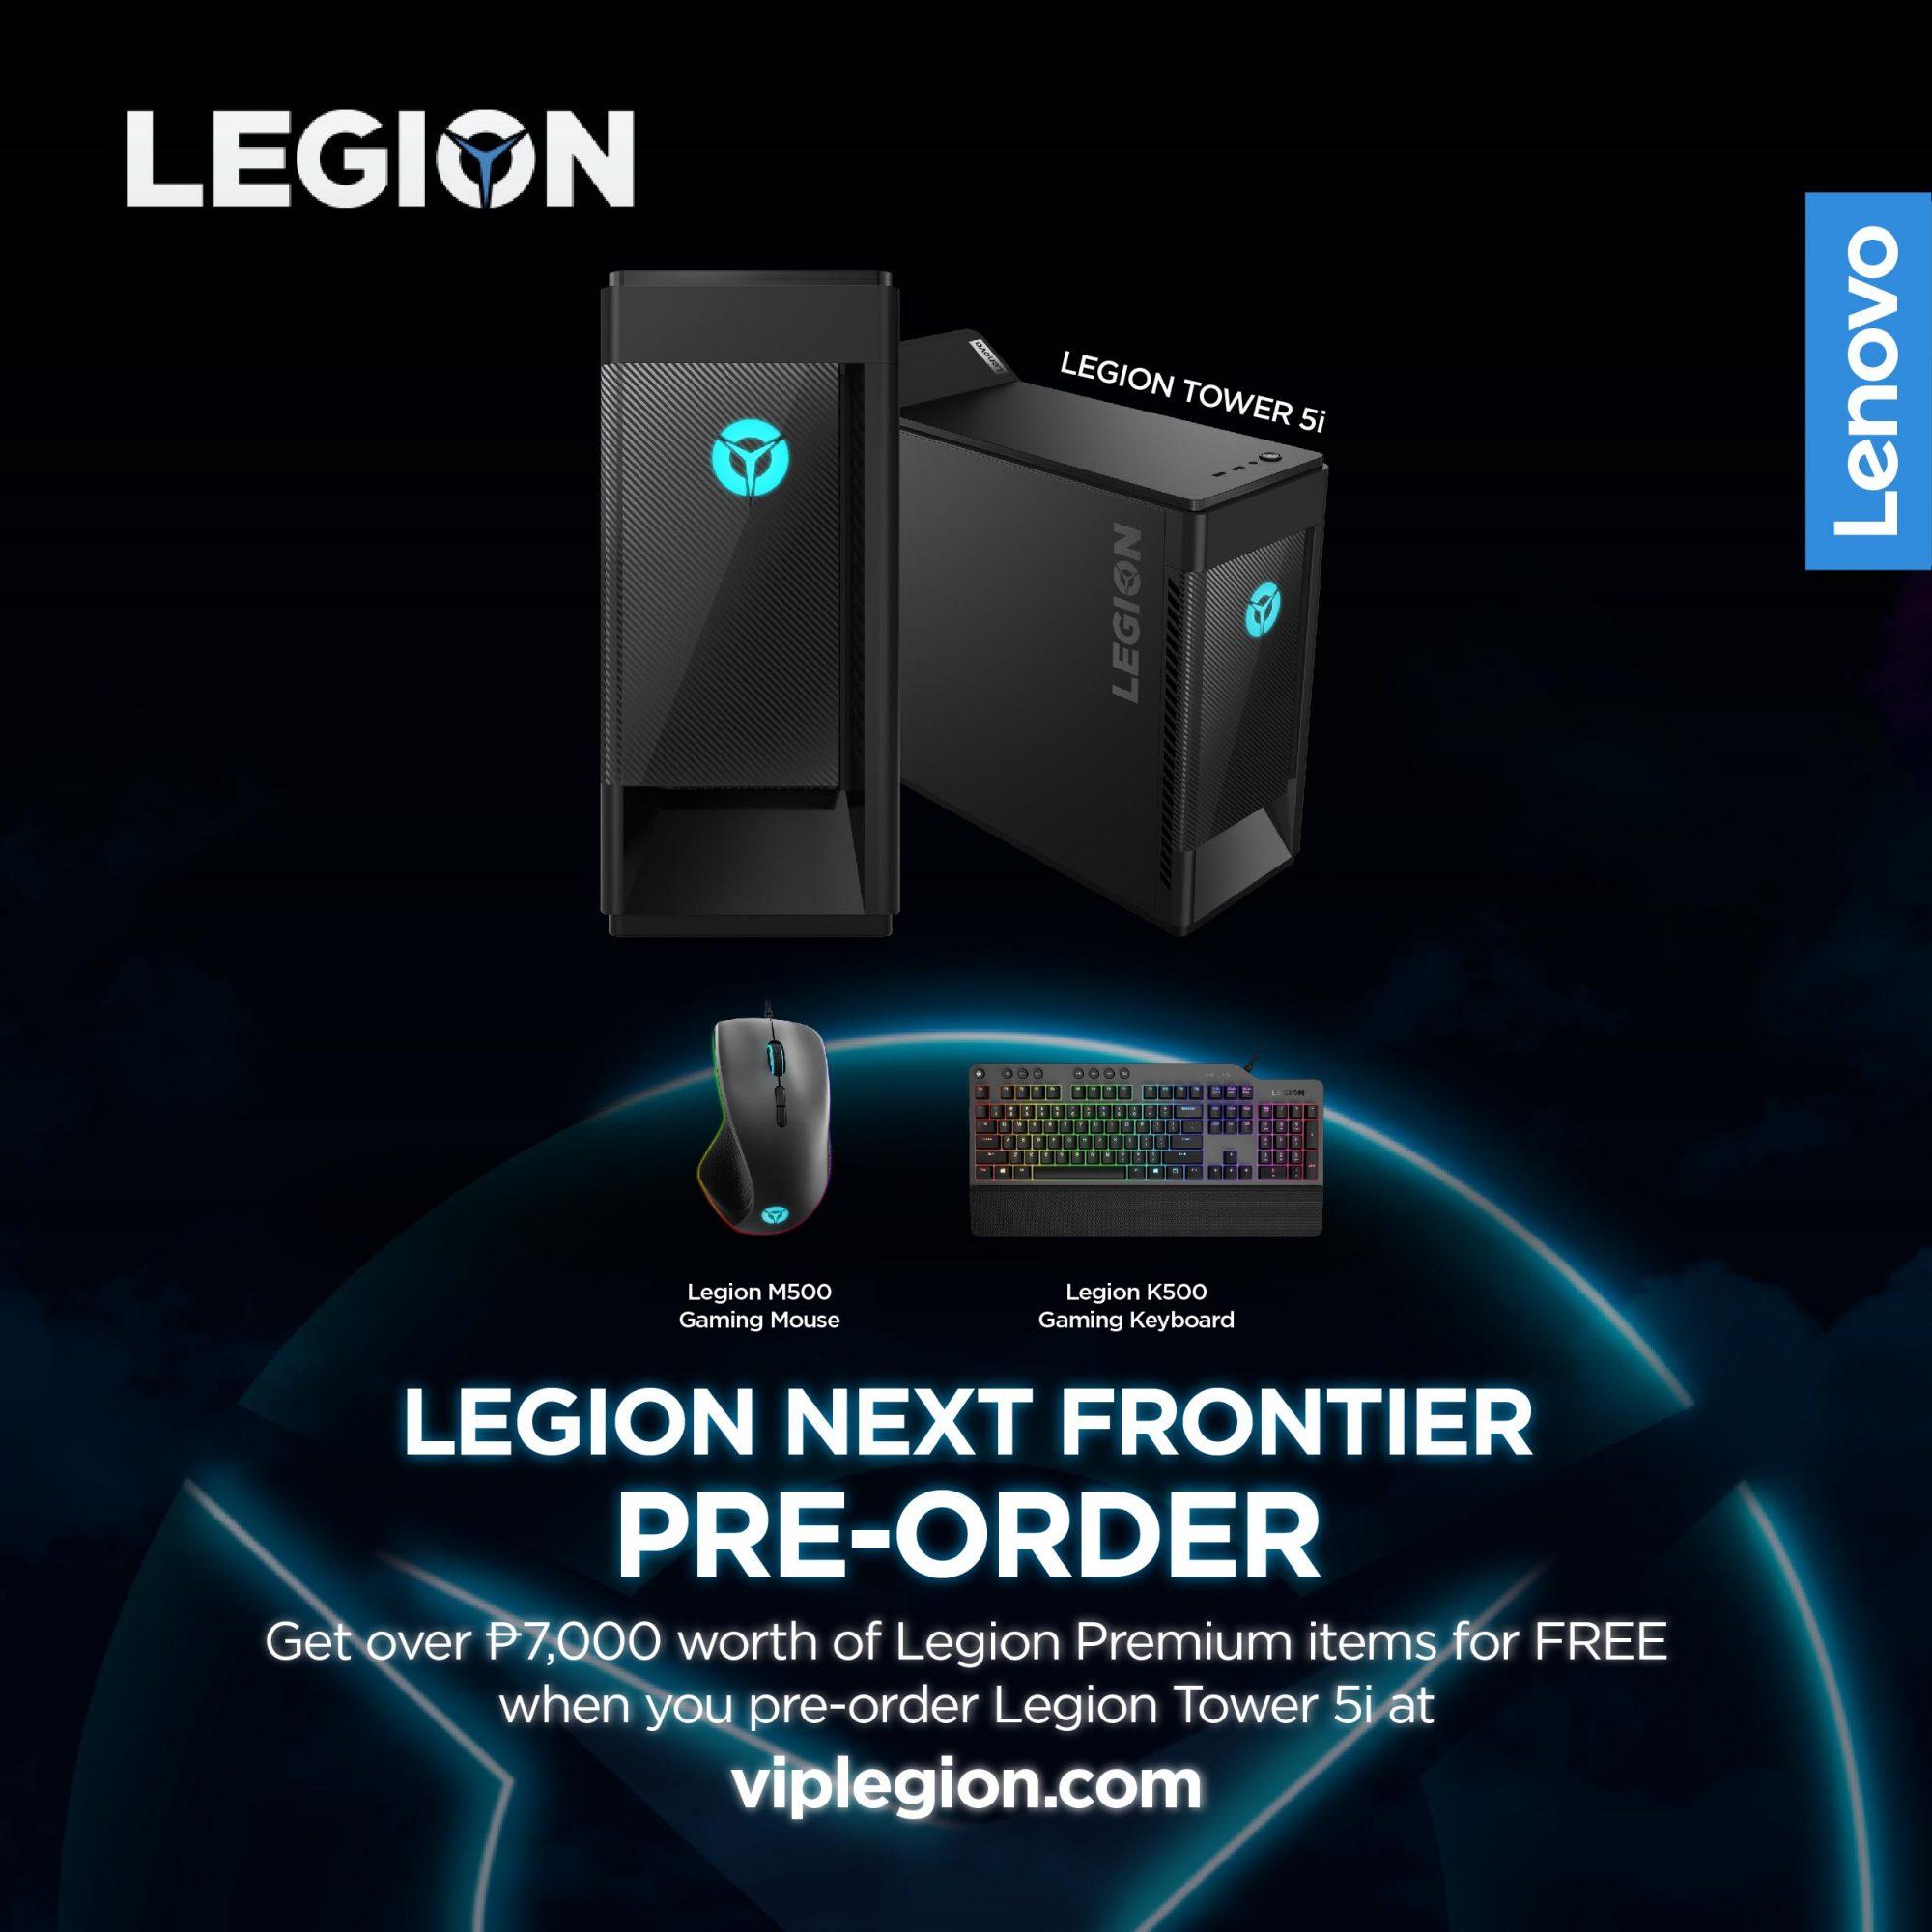 Legion Tower 5i pre-order